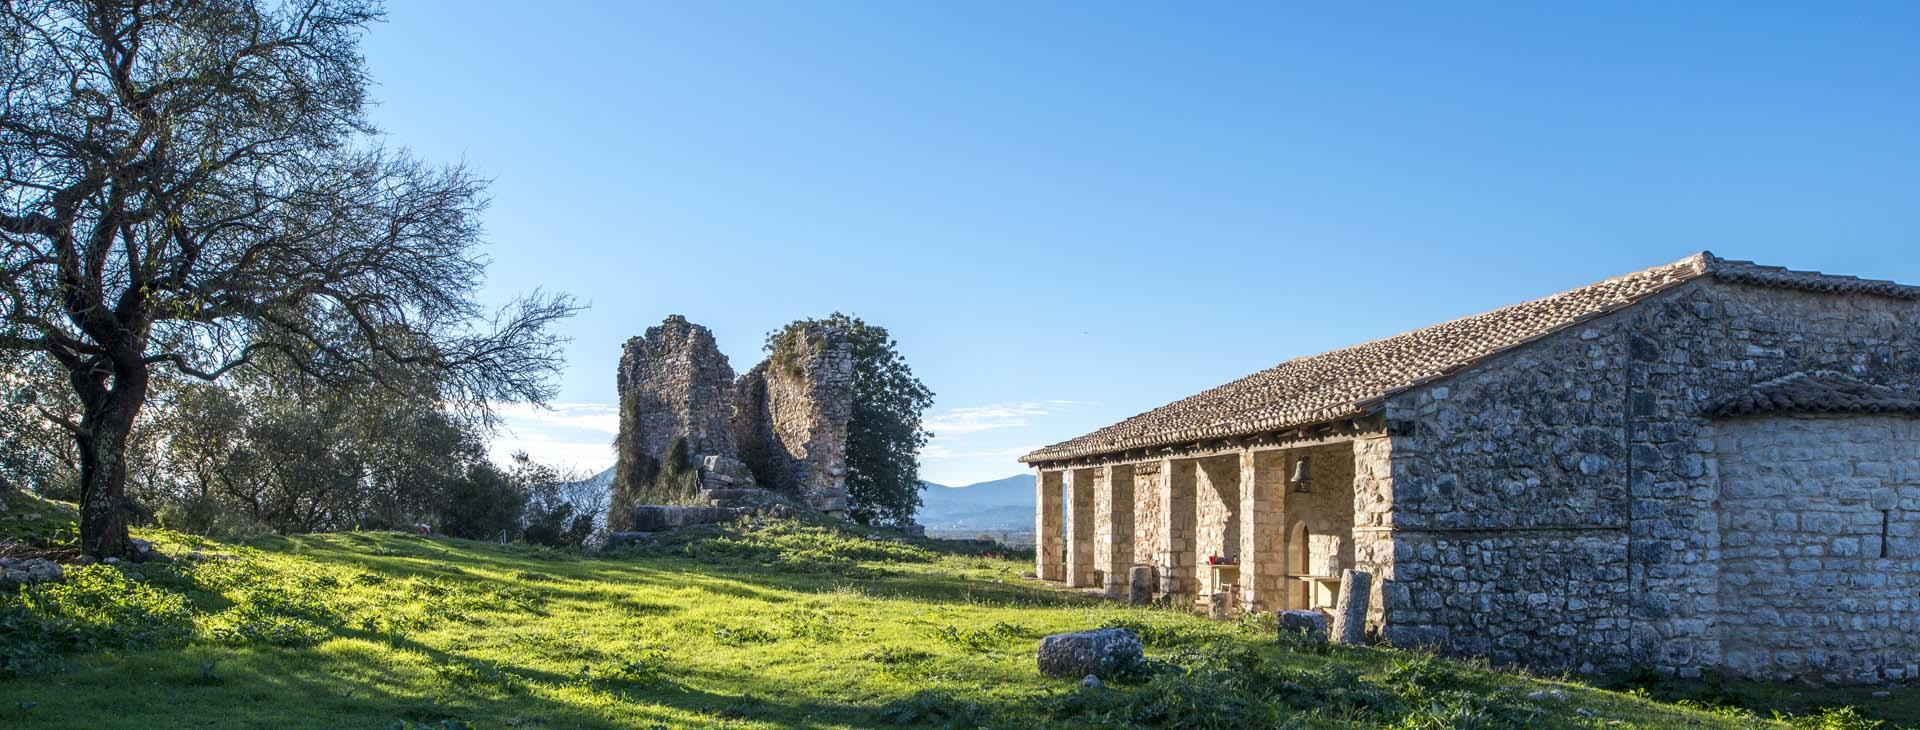 Castle of Rogoi and Assumption of the Theotokos, Preveza